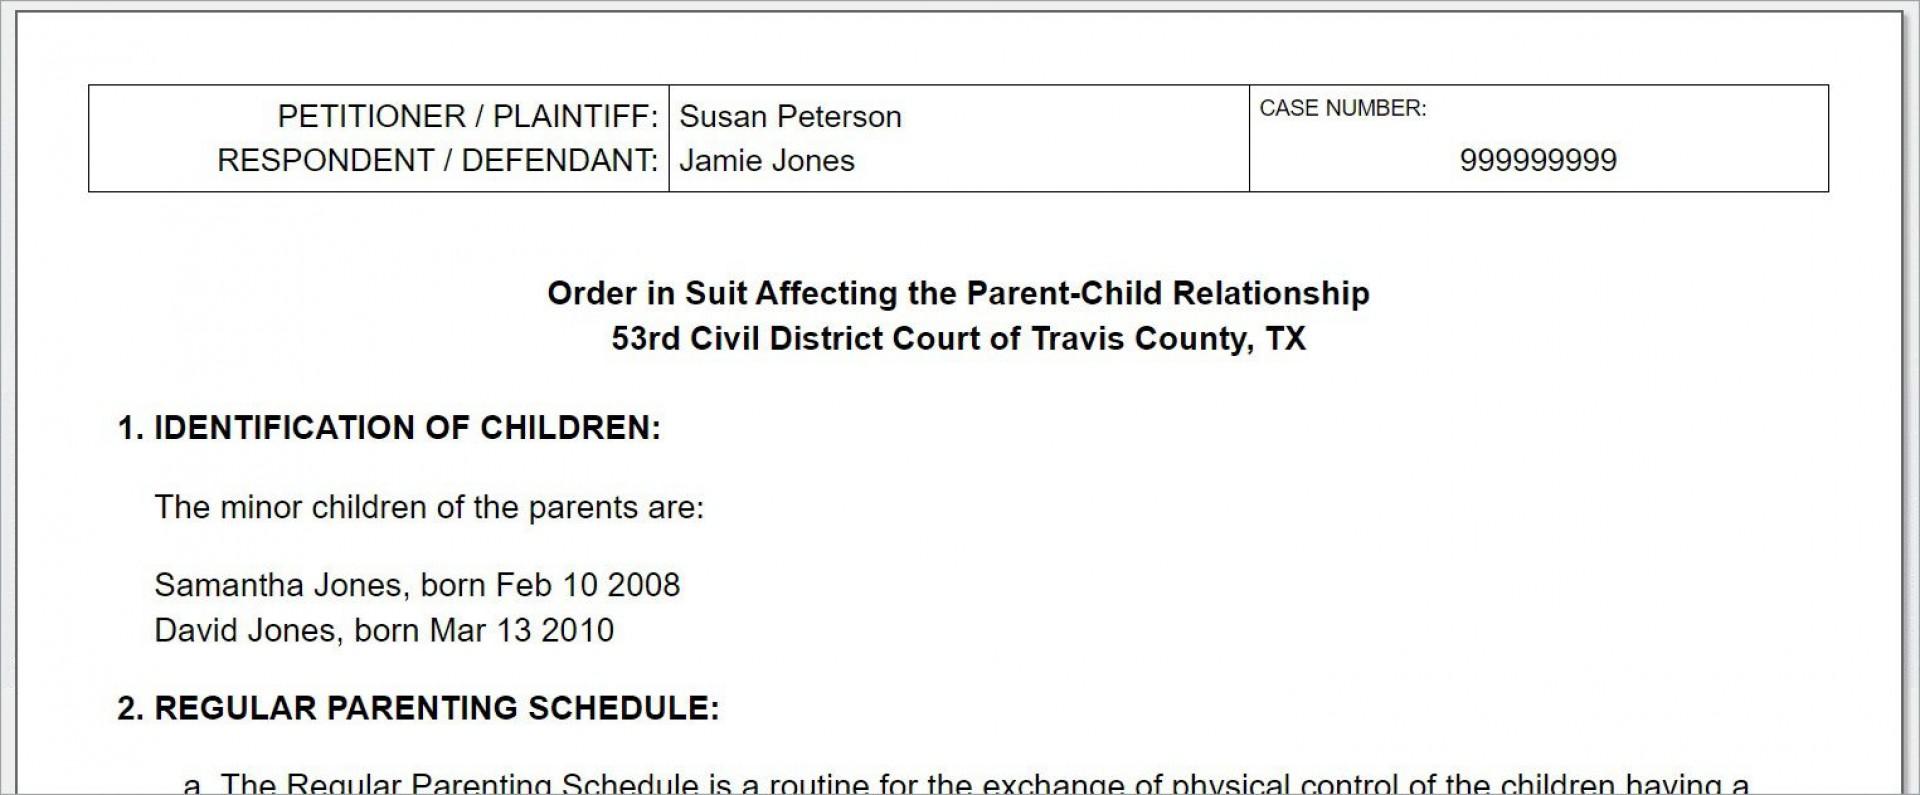 008 Breathtaking Child Custody Agreement Template Highest Quality  Texa Nj Uk1920